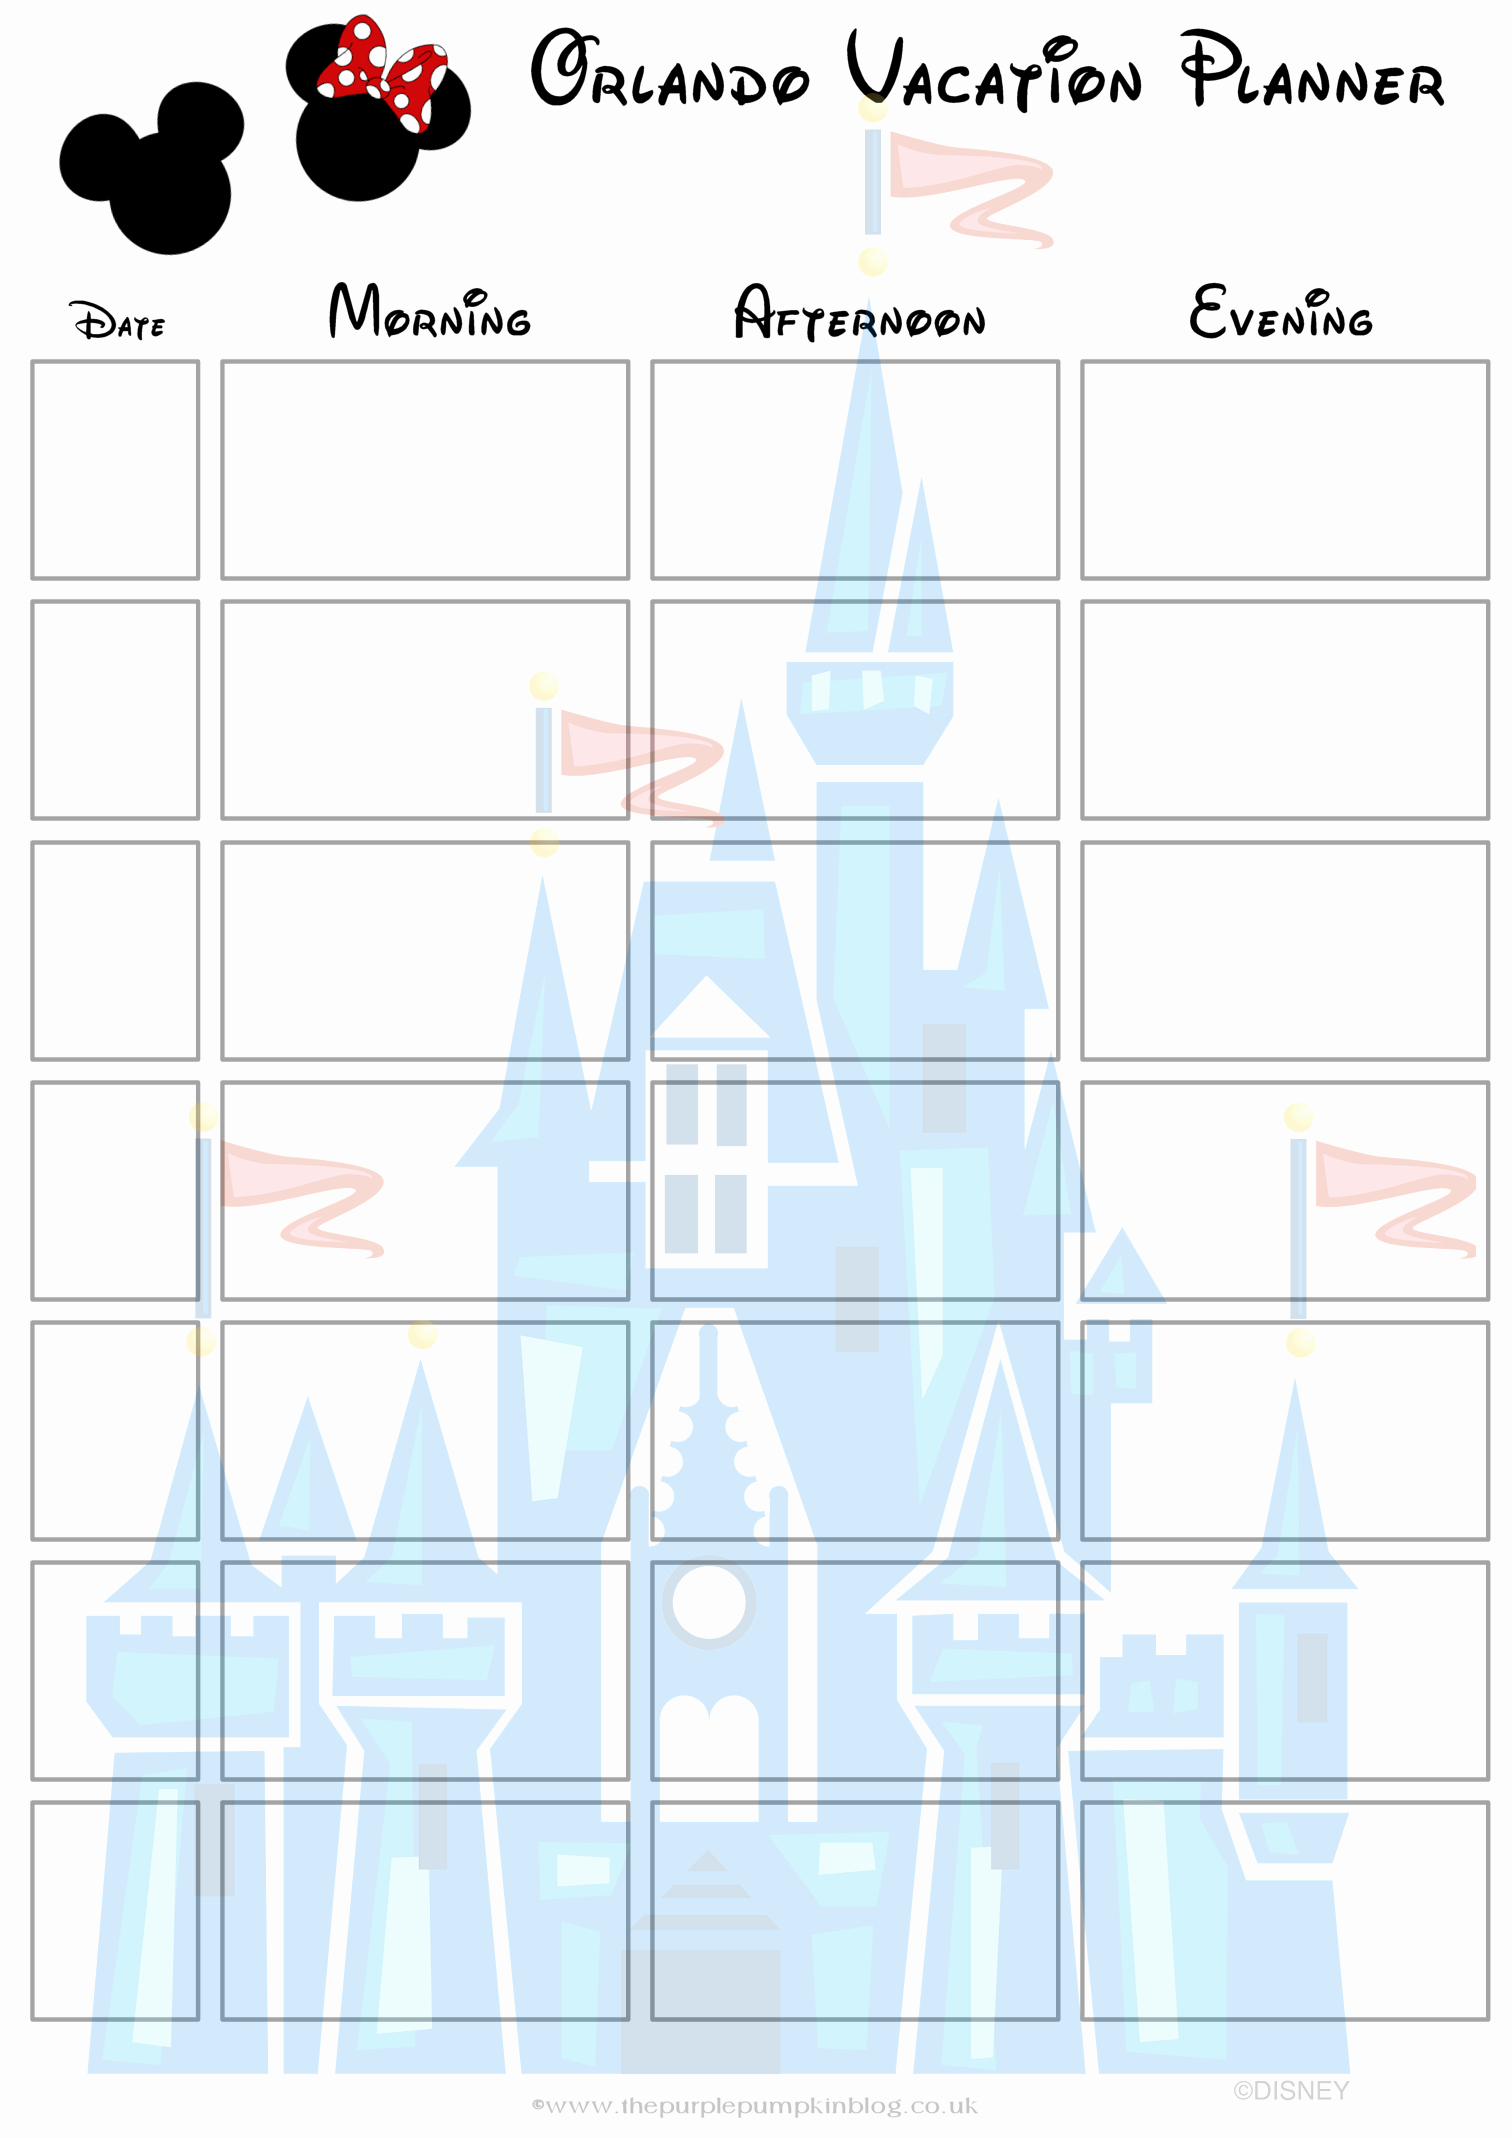 Free Printable Vacation Planner Template New orlando Walt Disney World Vacation Planner